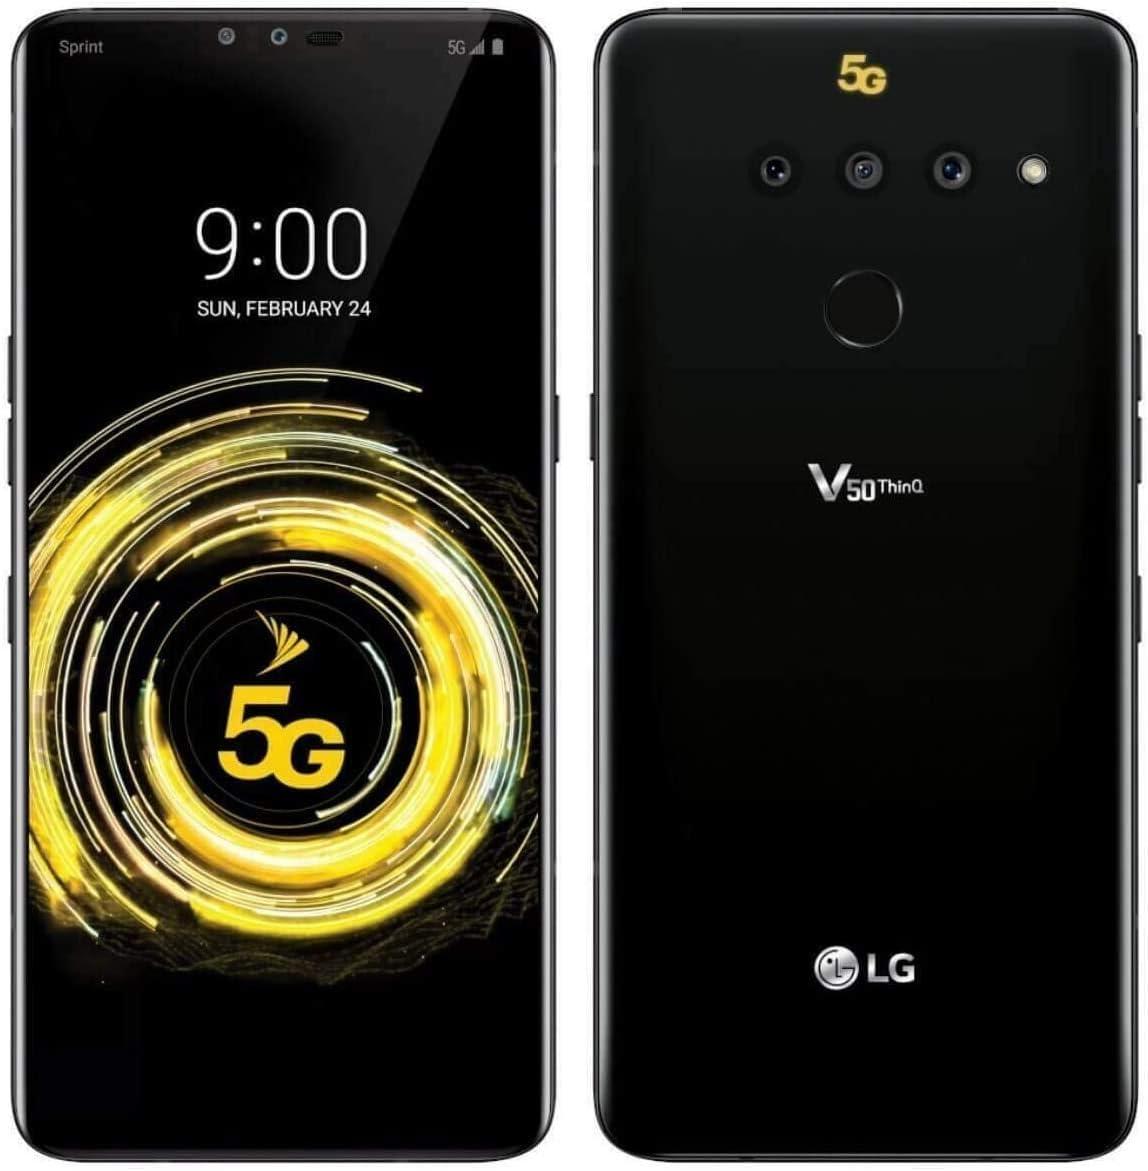 LG Max 52% OFF V50 ThinQ 5G 128GB LM-V450 Sp Black Cash special price Renewed Smartphone